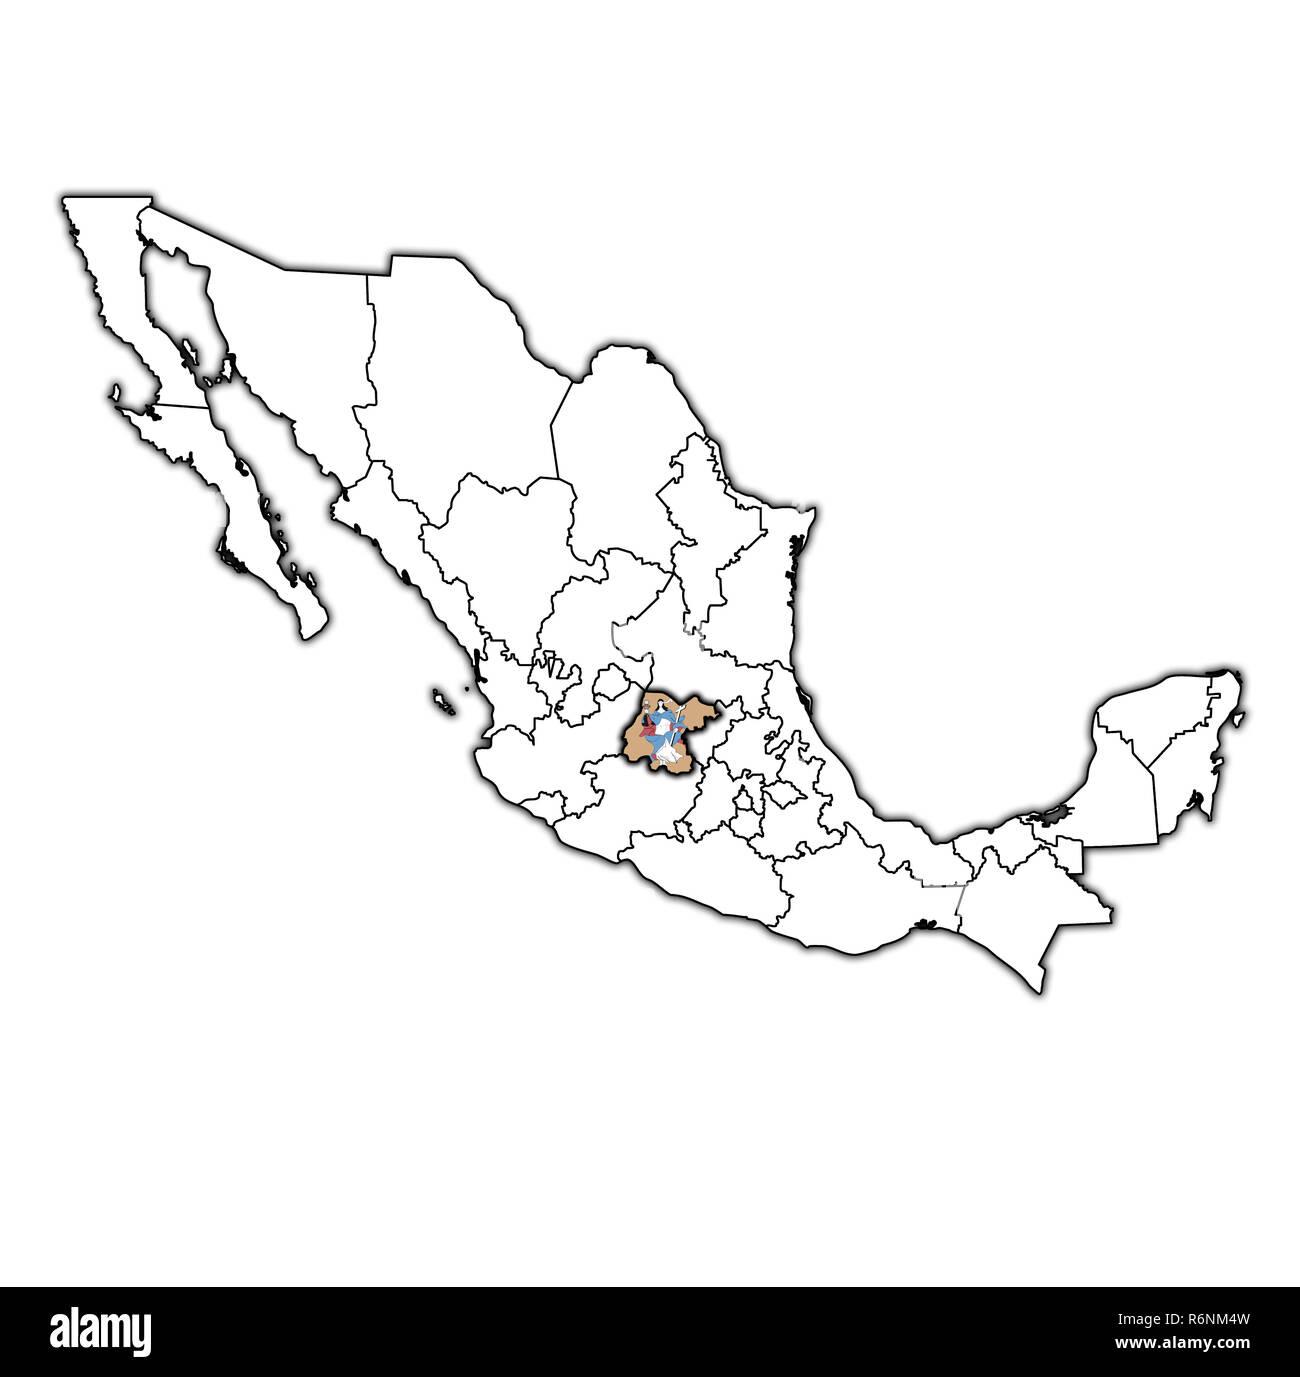 Mexico Map Guanajuato.Guanajuato On Administration Map Of Mexico Stock Photo 227899529